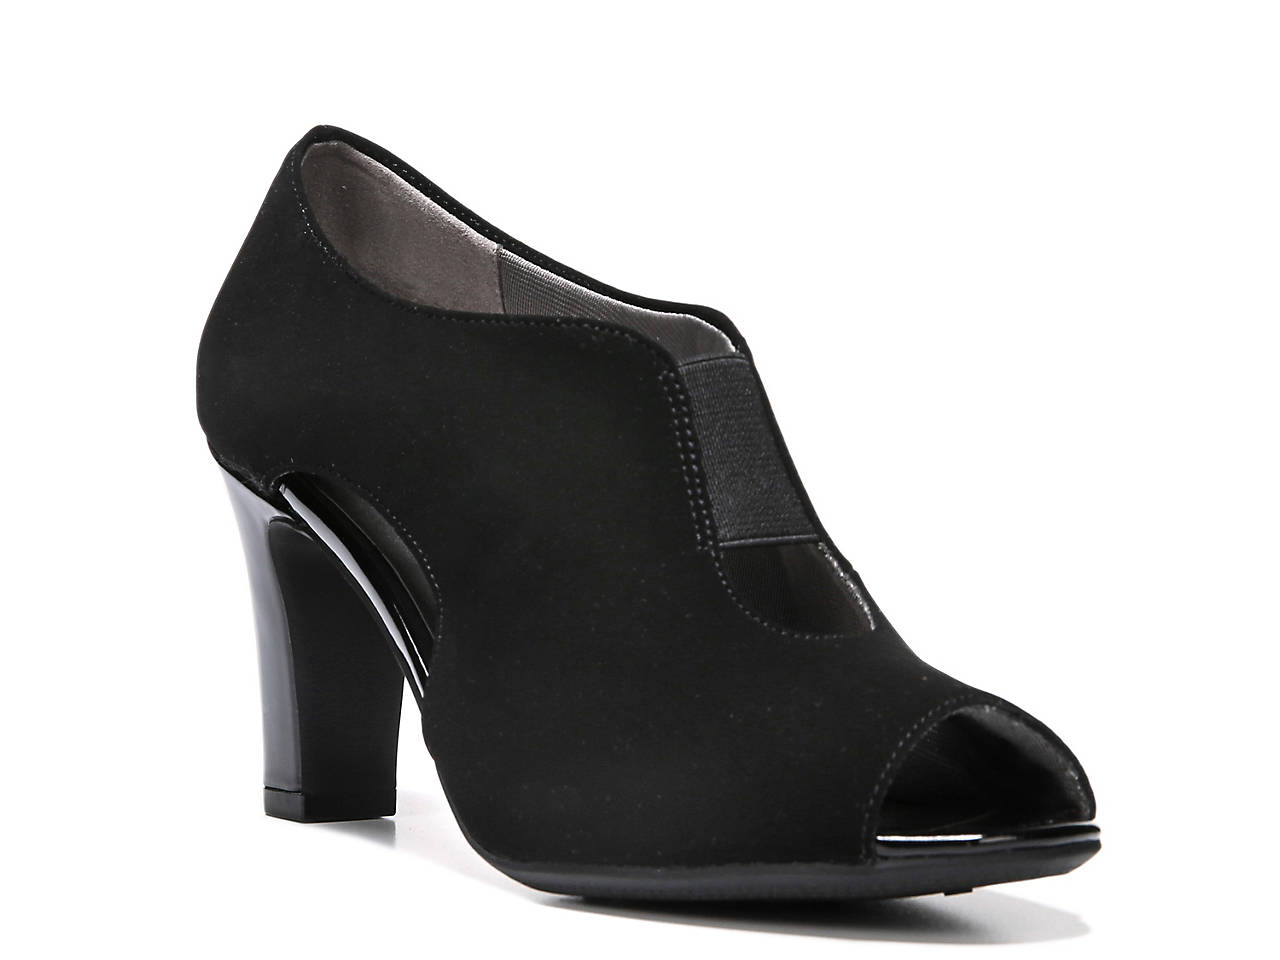 3dad4eb21ac2 LifeStride Carla Bootie Women s Shoes